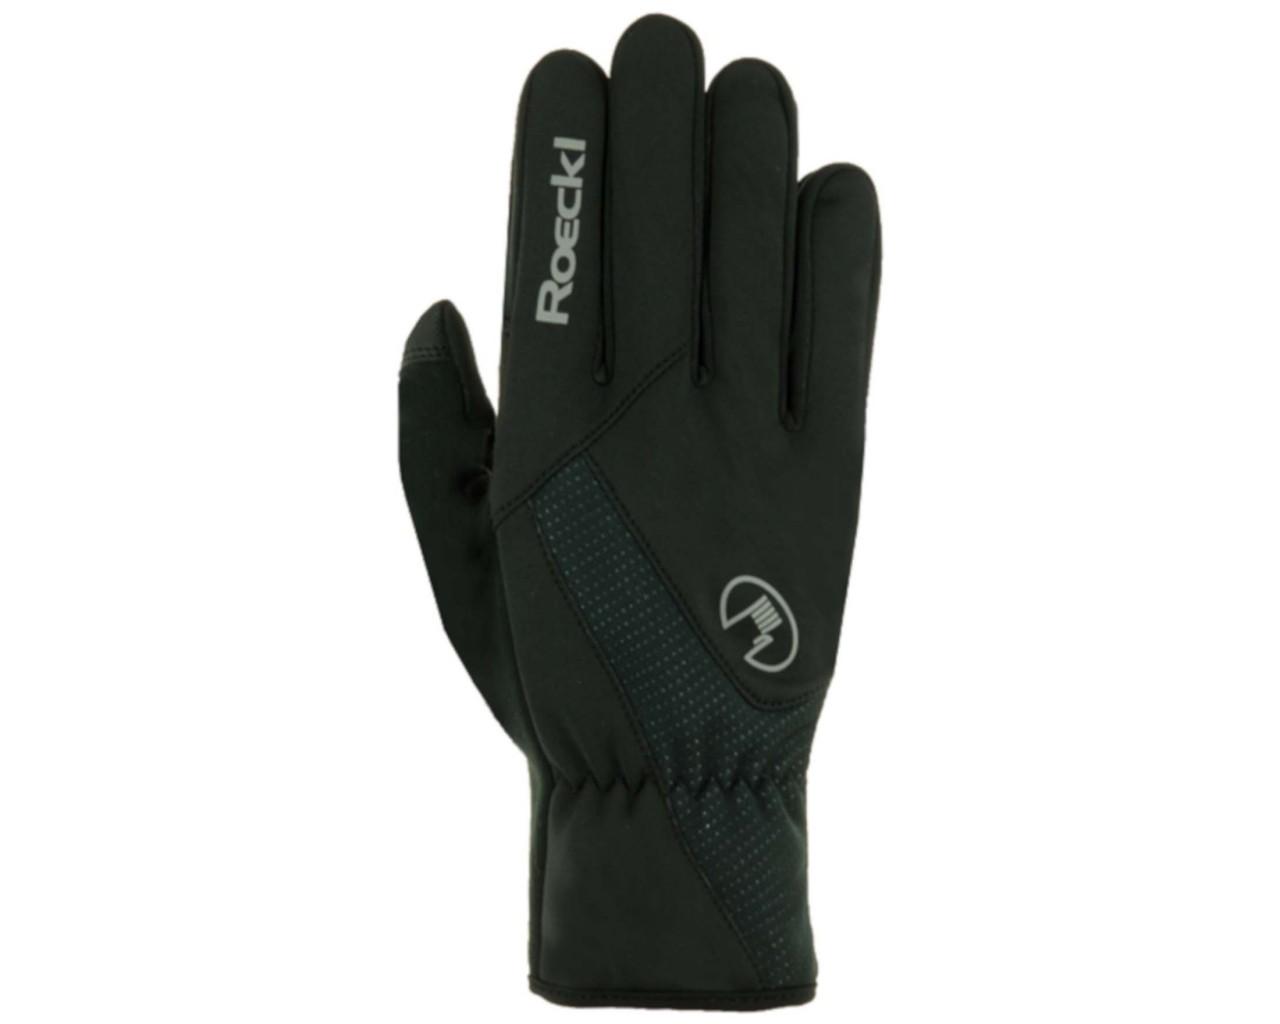 ROECKL Roth Handschuhe langfinger | black